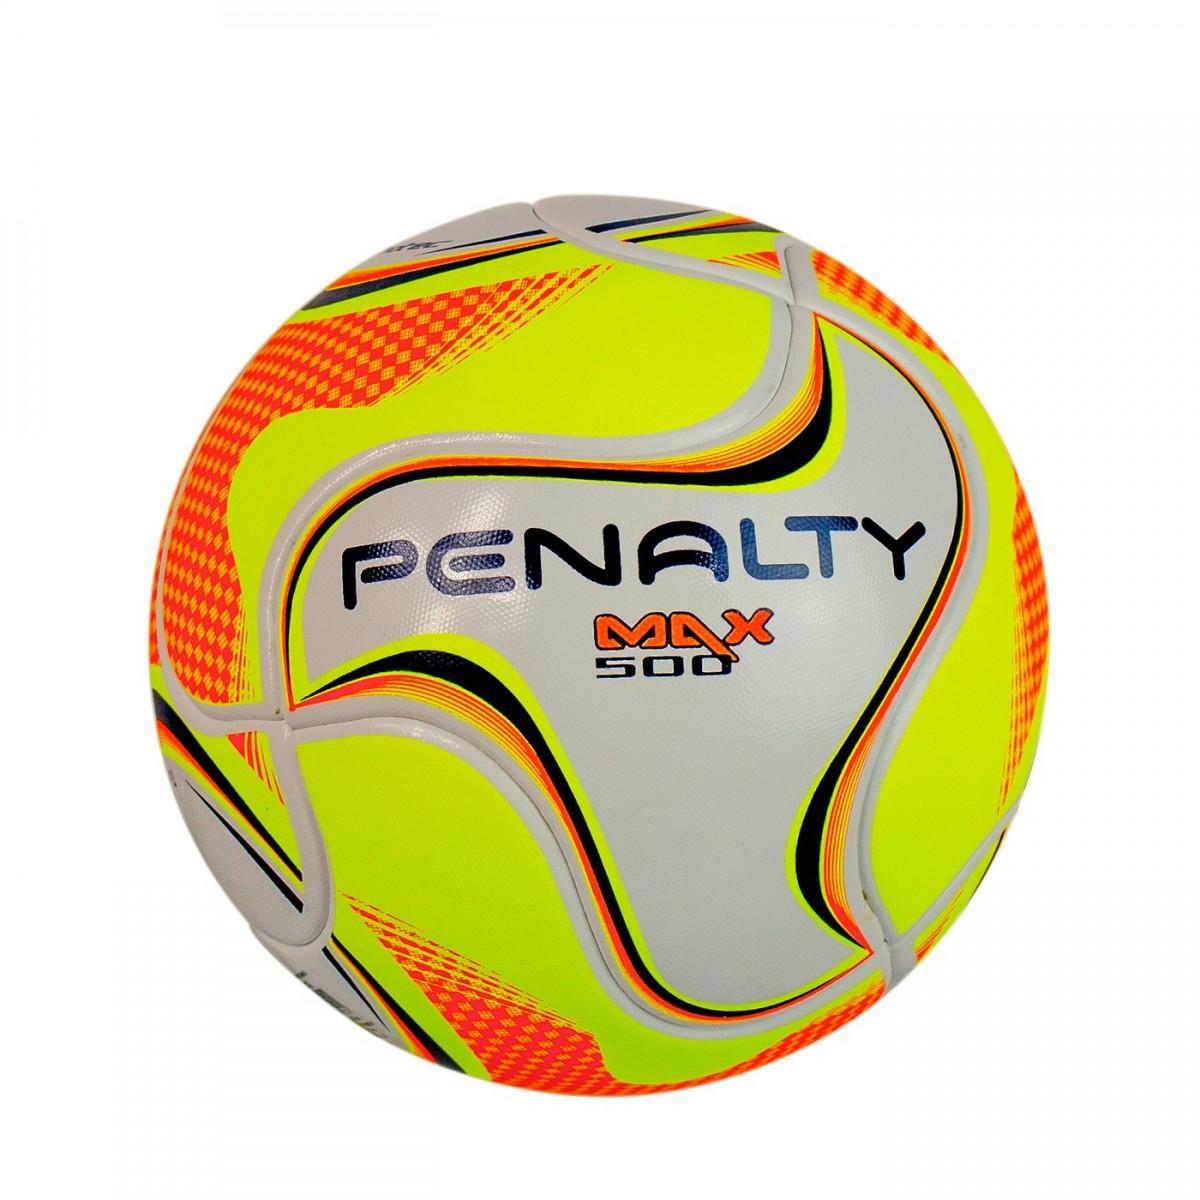 1f5b0f424a Bizz Store - Bola Futsal Max 500 Term Penalty Oficial Branca